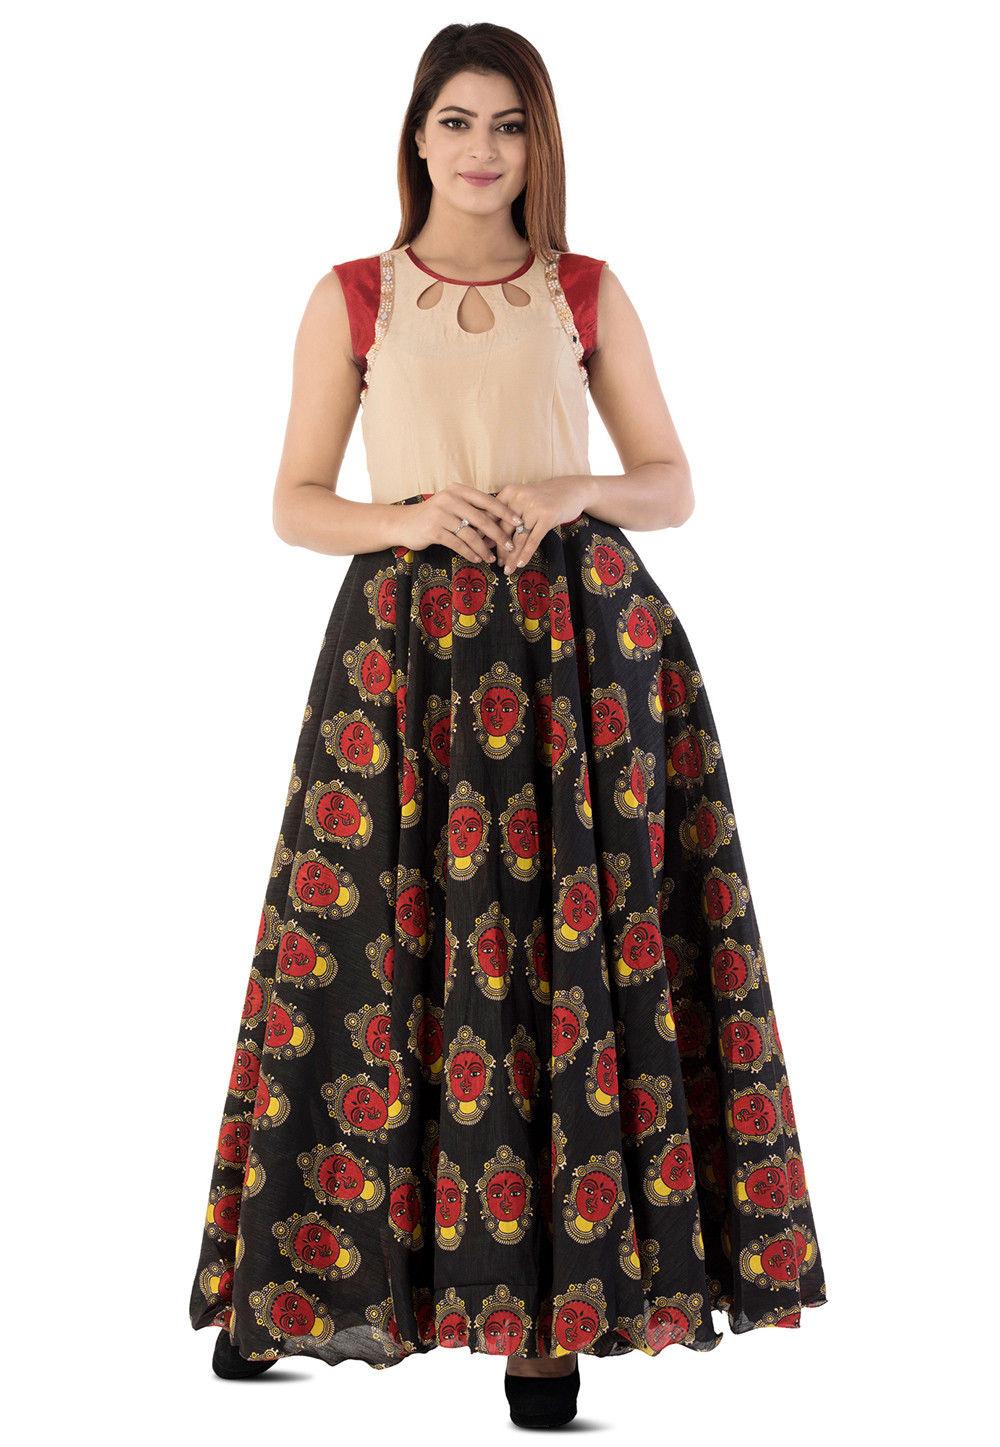 Utsav fashion shopping bag - Kalamkari Printed Cotton Silk Circular Gown In Black And Beige